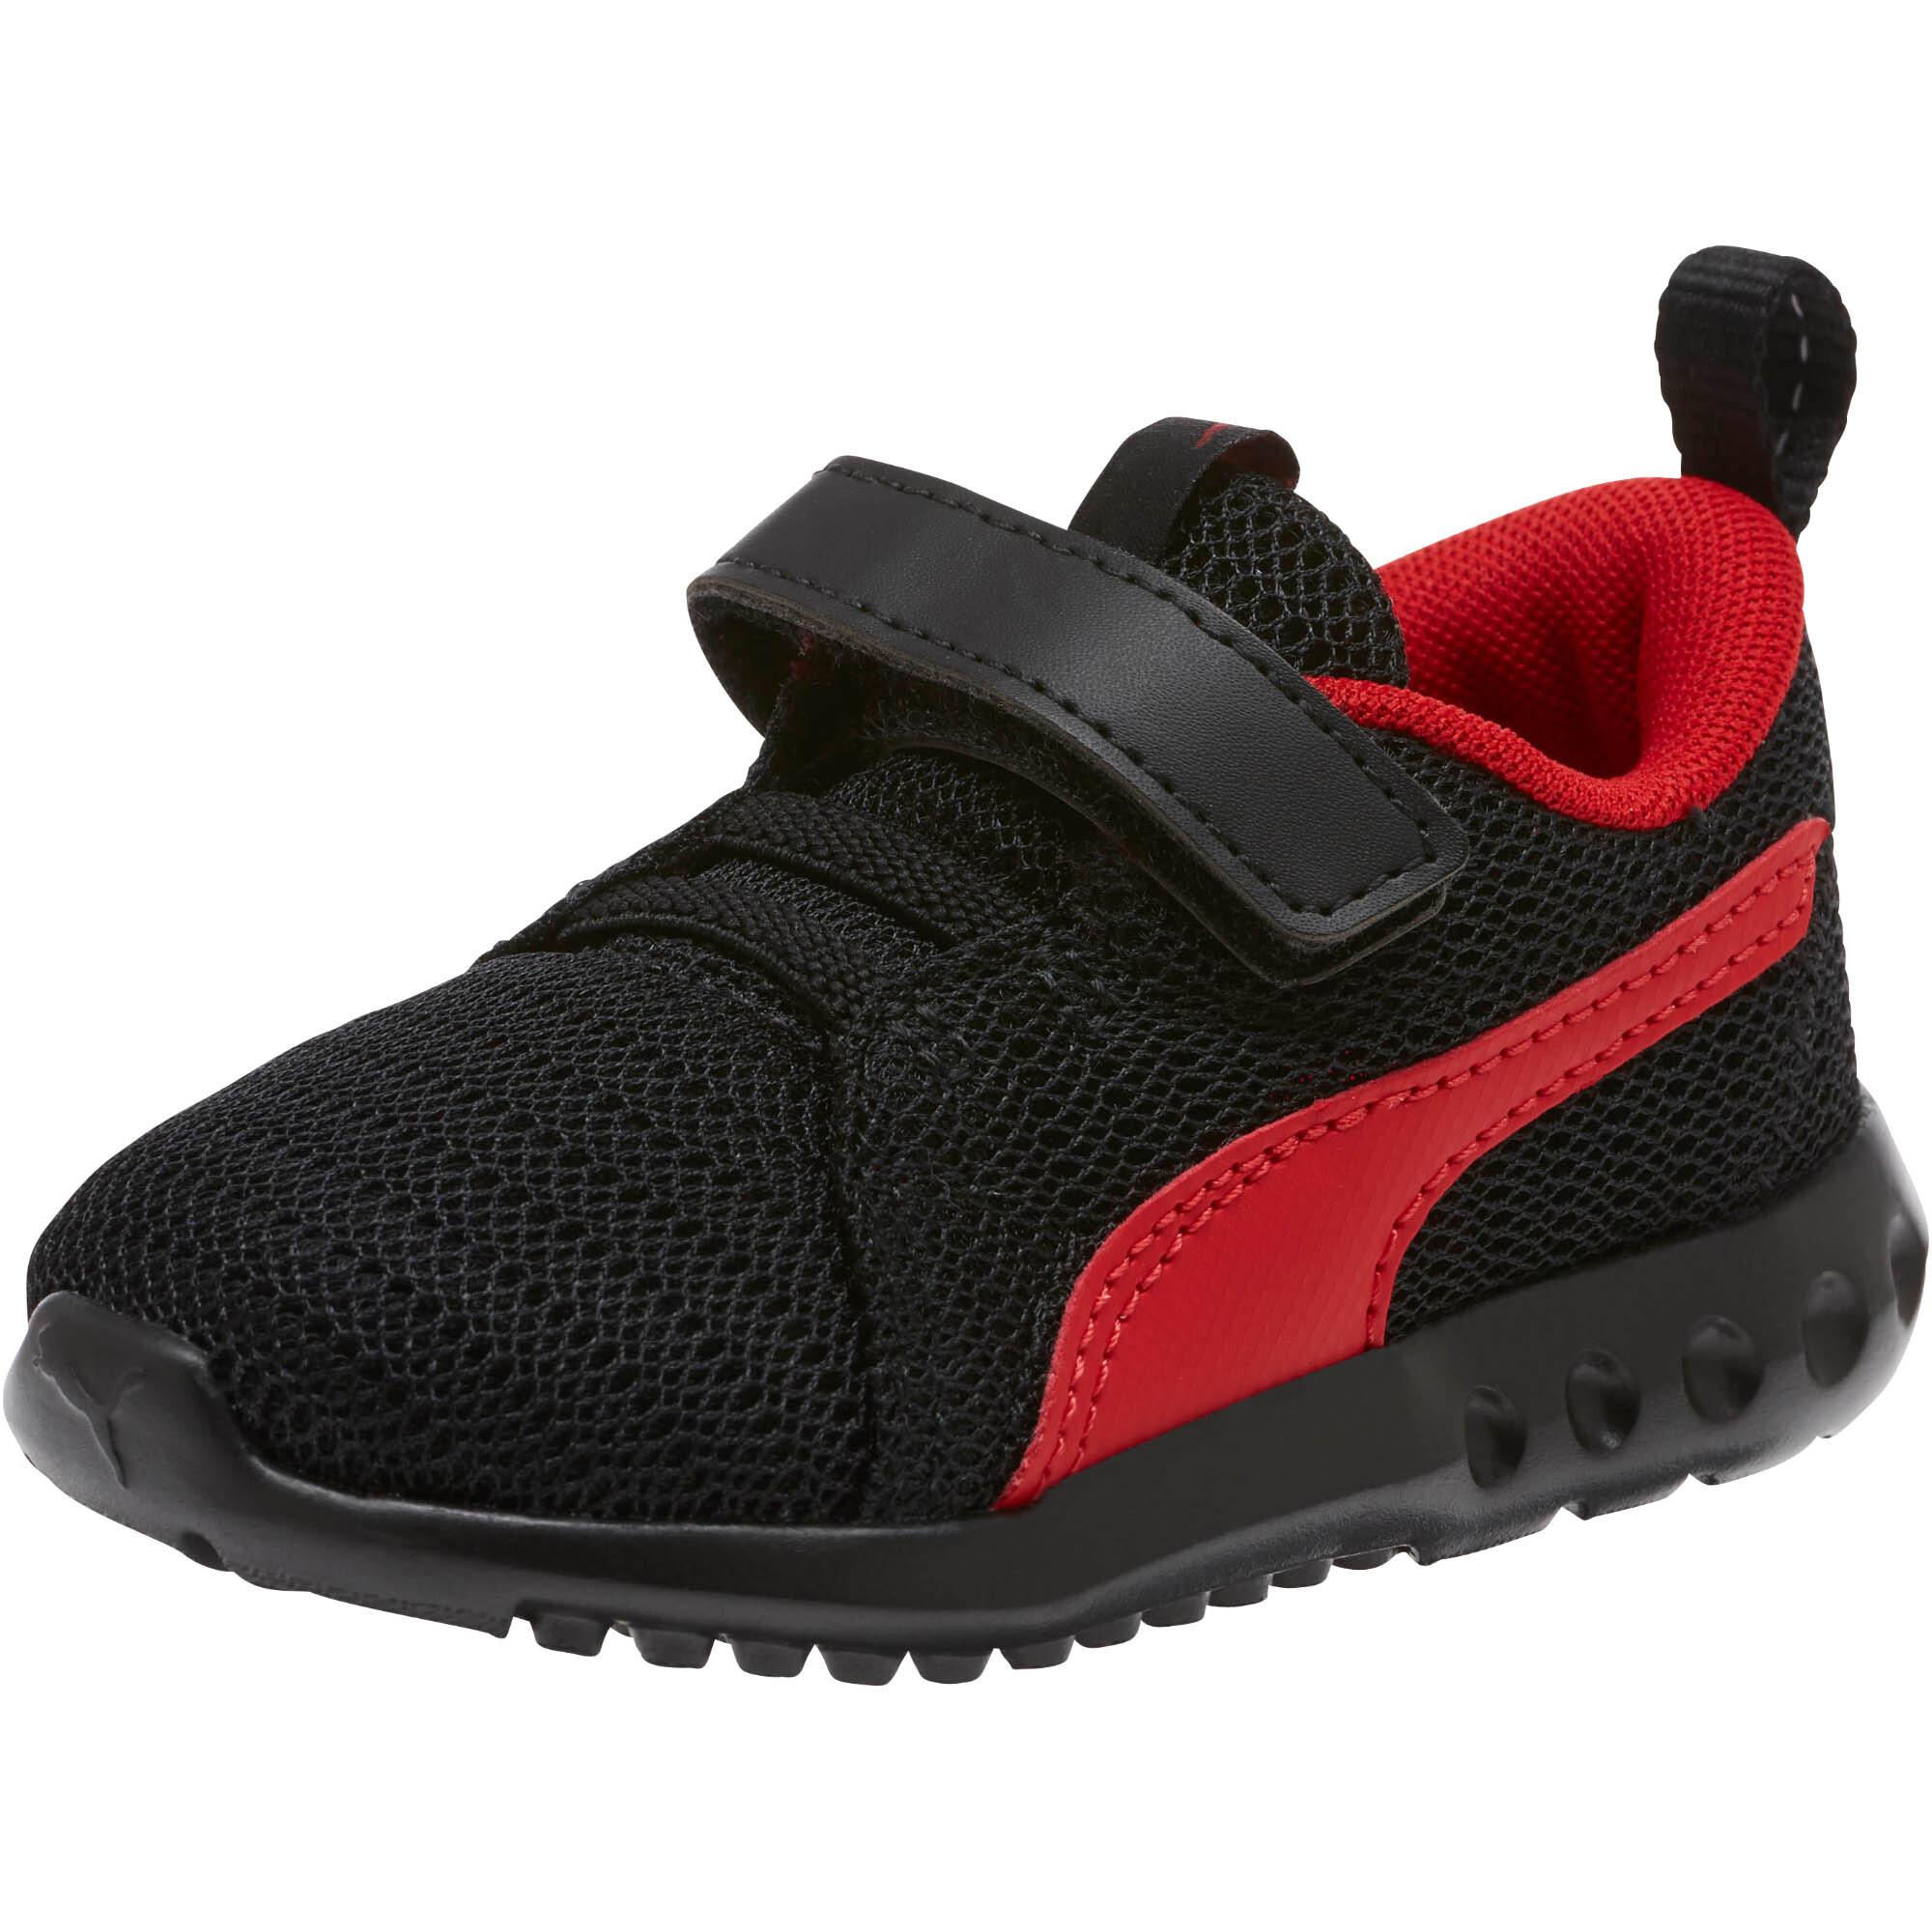 PUMA-Carson-2-Toddler-Shoes-Unisex-Shoe-Kids thumbnail 18